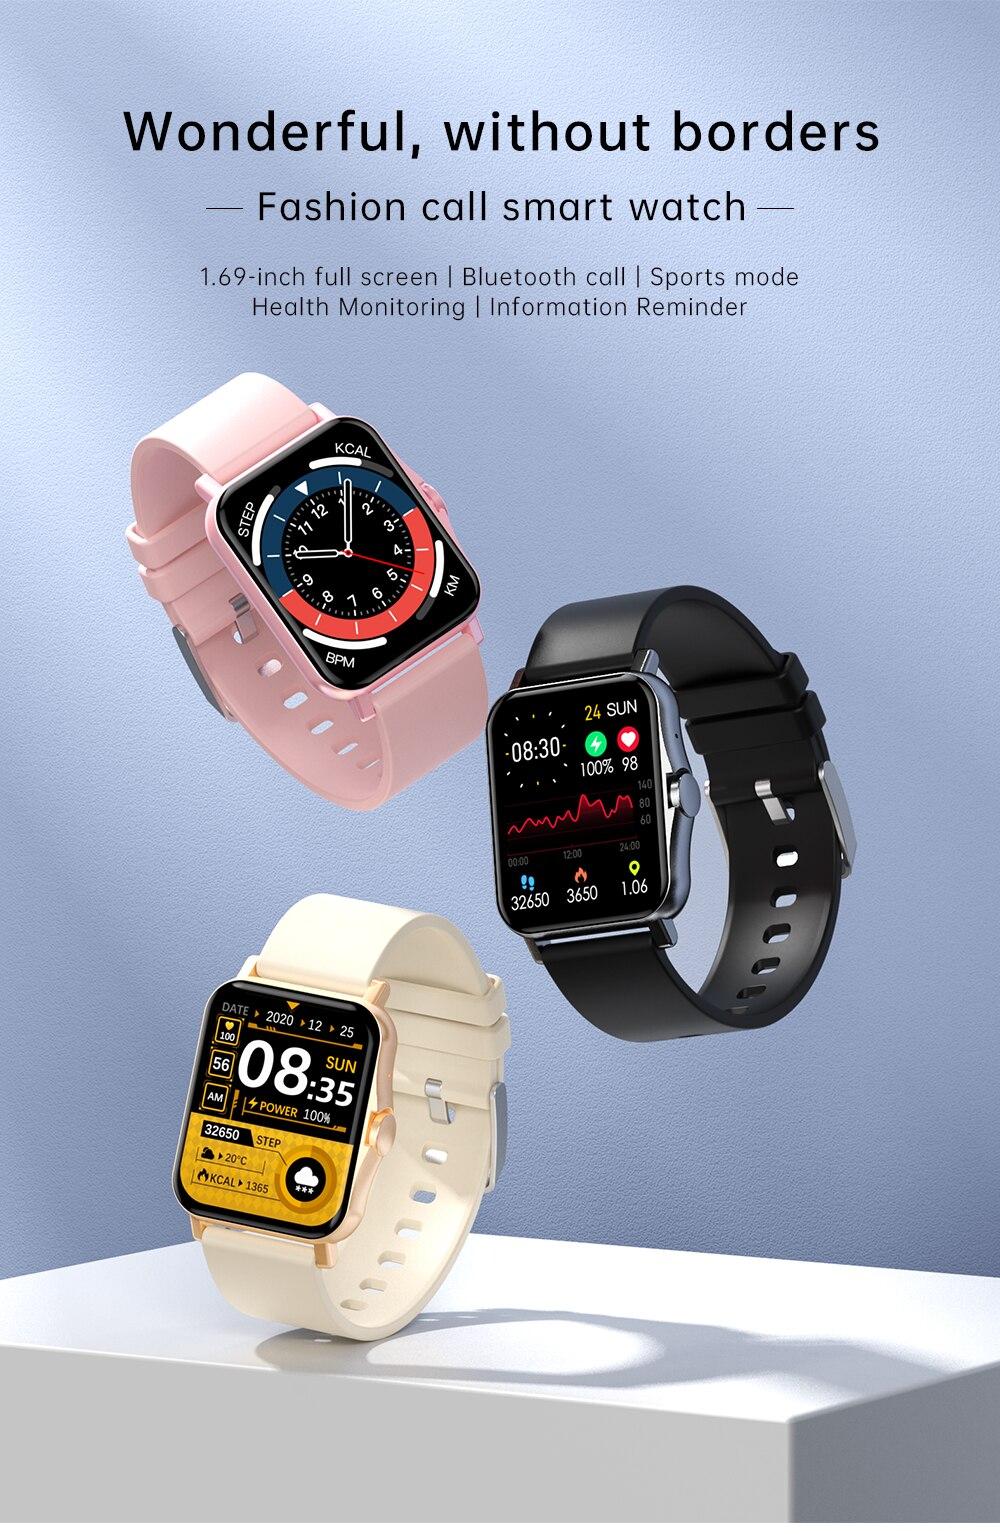 H8806e7c0f7c748cba10e3addadd26665K Reloj Inteligente Mujer Smartwatch Android Men 2021 Smart Watch Man Bluetooth Call Smartwatch Women For Xiaomi Mi Phone GTS 2